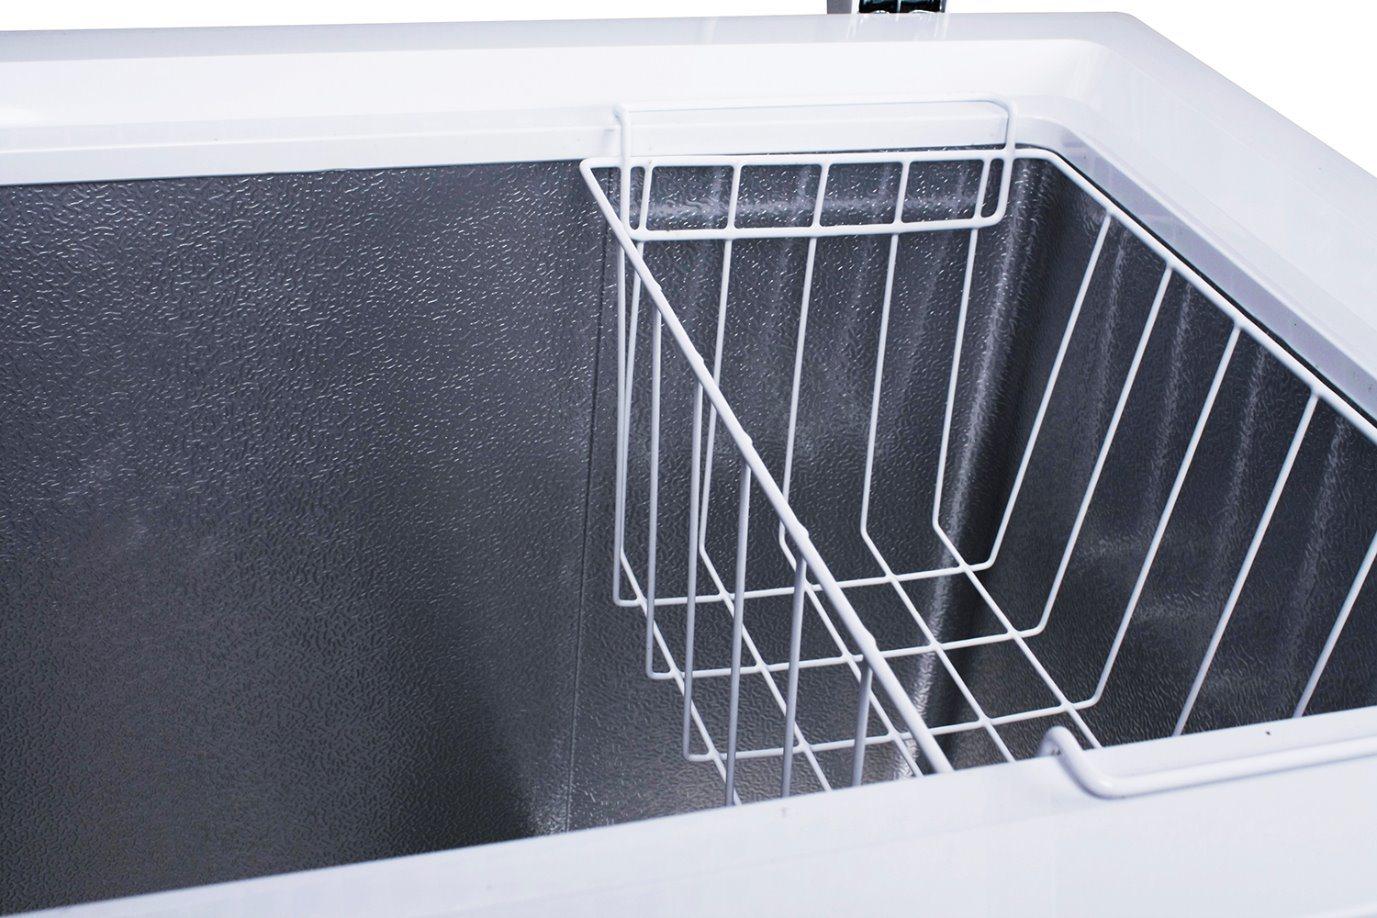 DC 12V 24V Solar Freezer Commercial Chest Freezer 230L